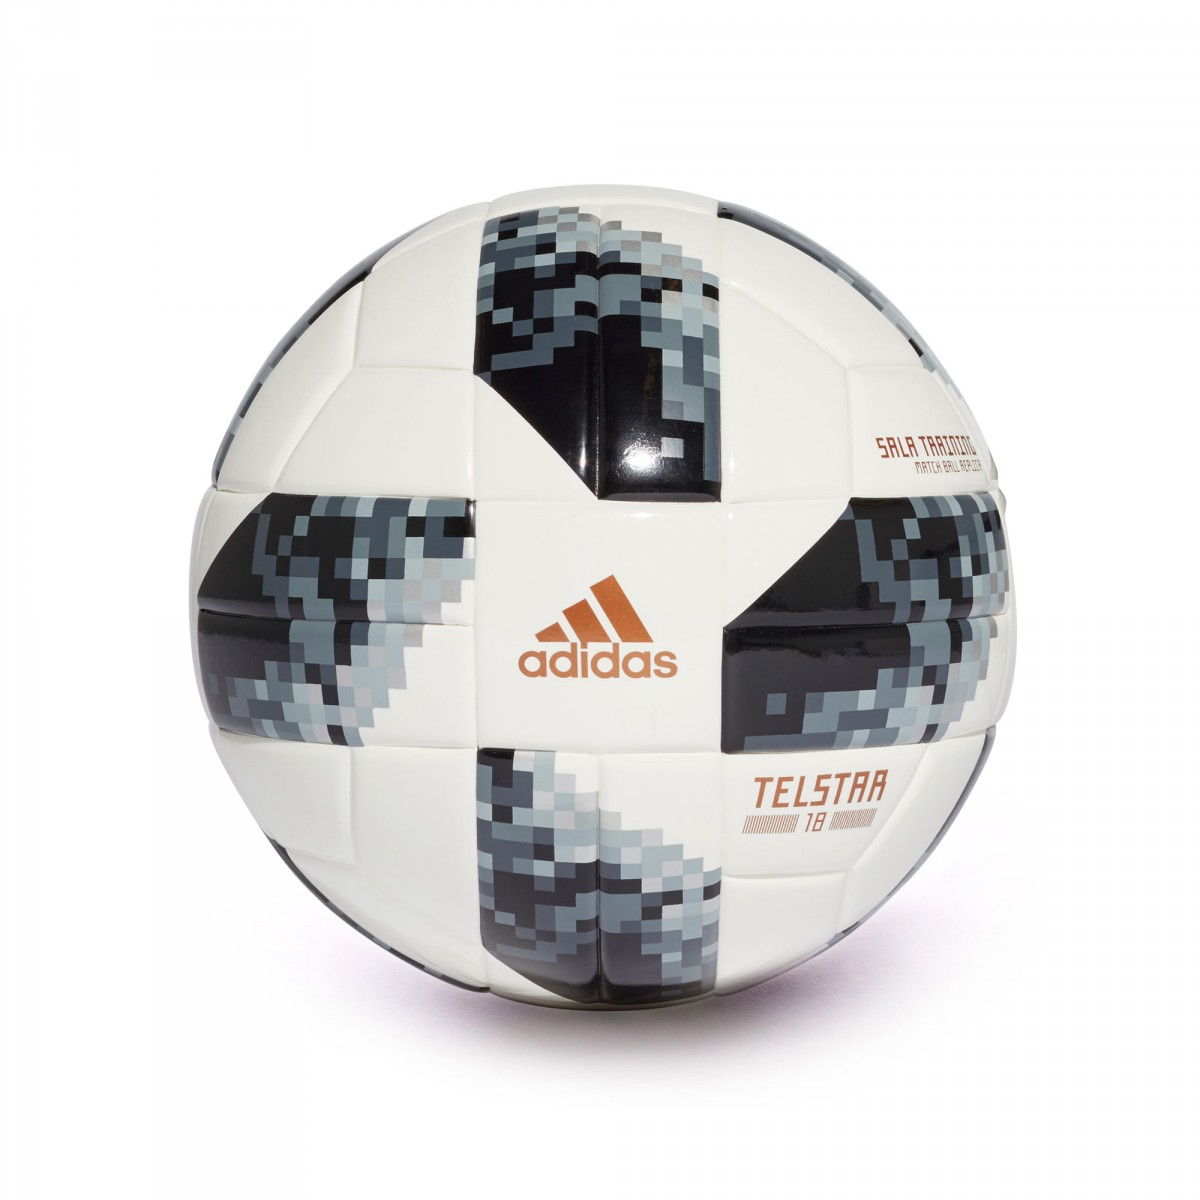 030893a60 adidas World Cup Sala Training Telstar Ball. White-Black-Silver metallic ...